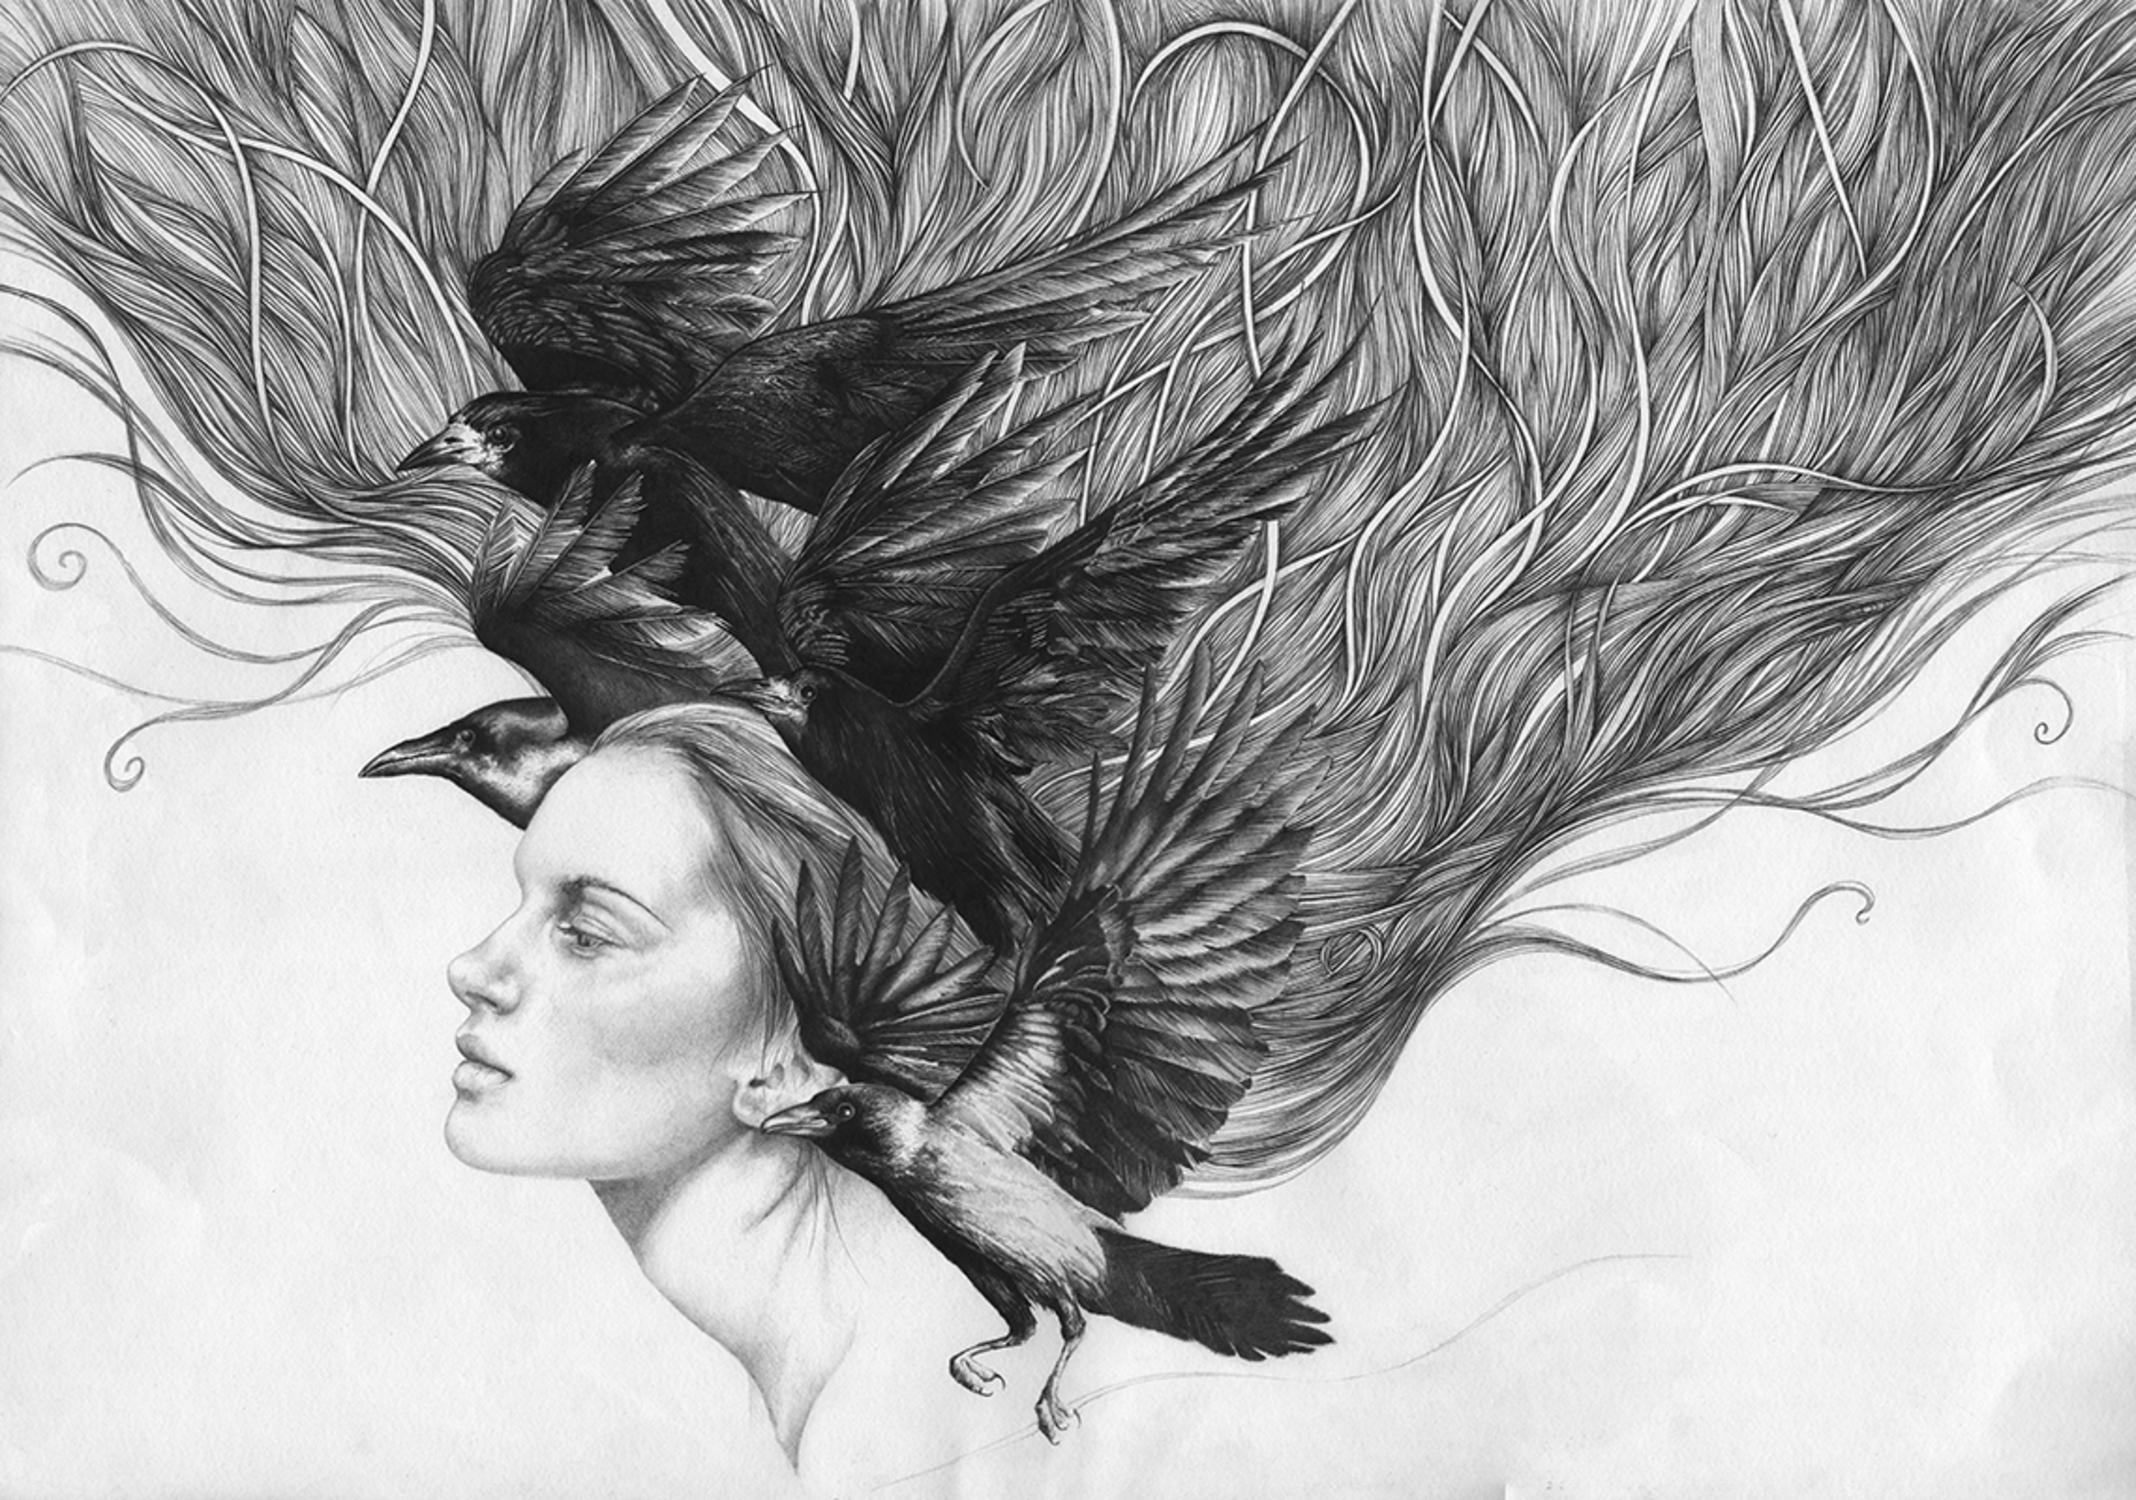 The Dream Thief Artwork by Bonnie Helen Hawkins